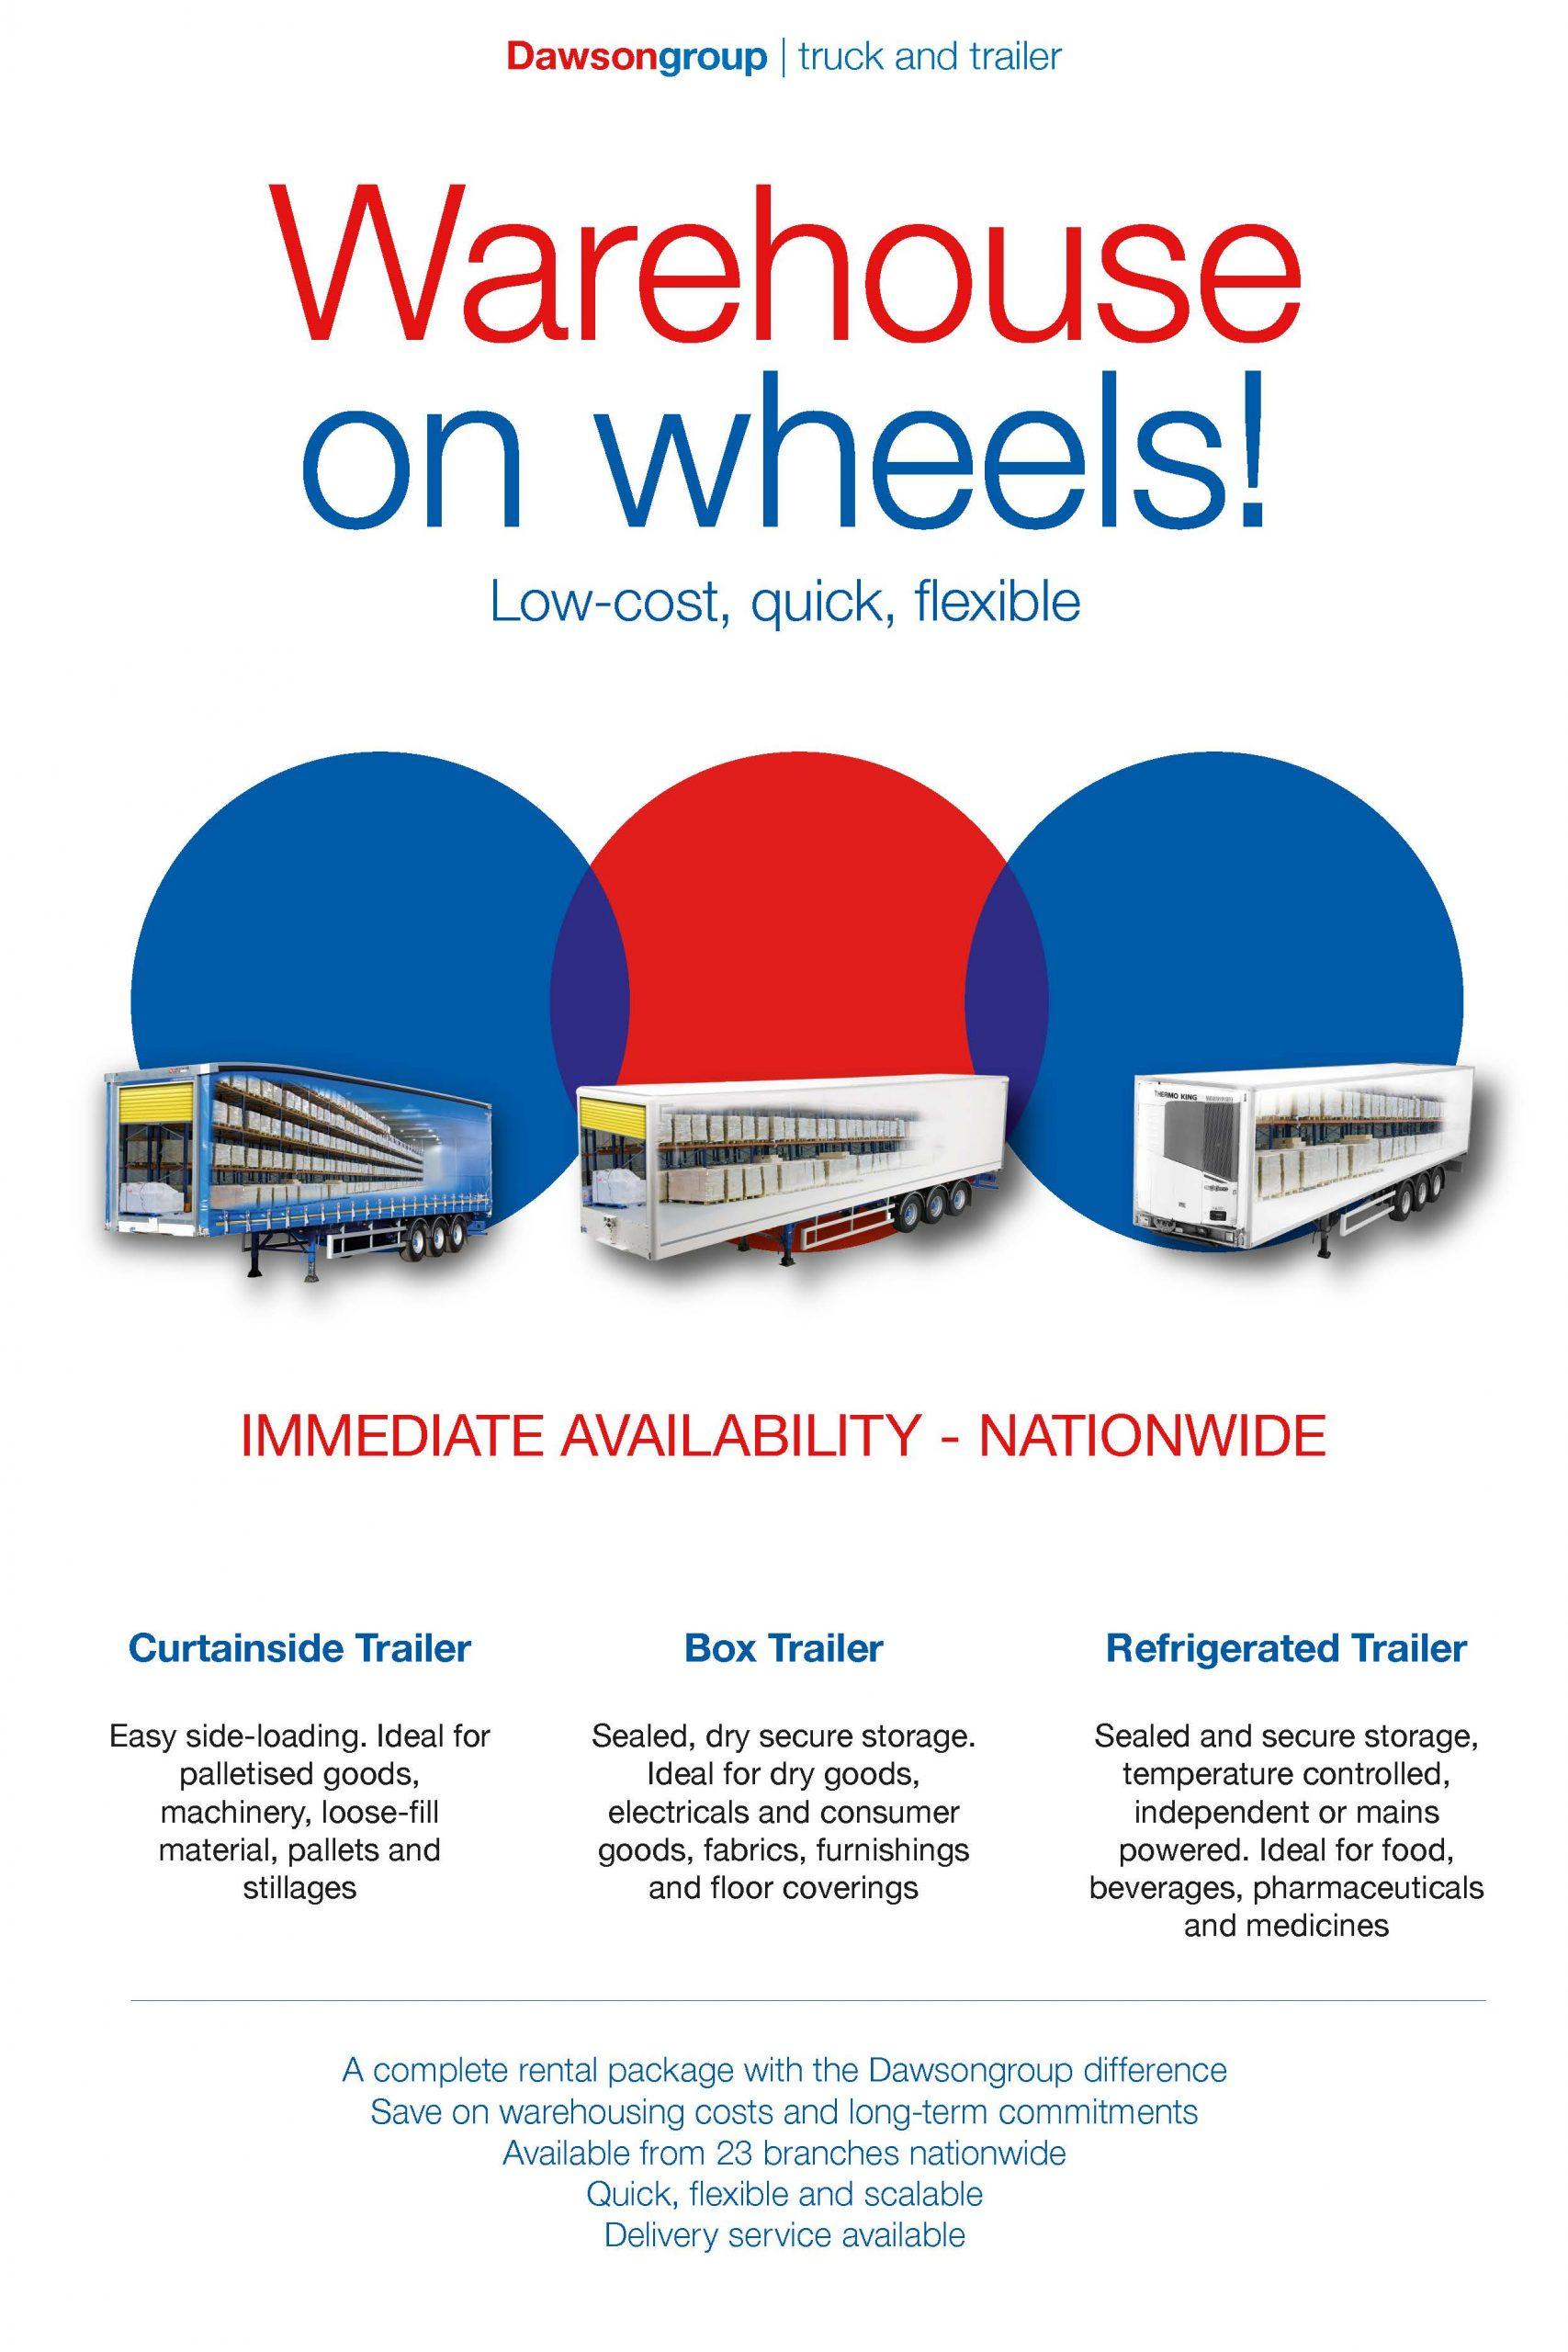 Warehouse on wheels!